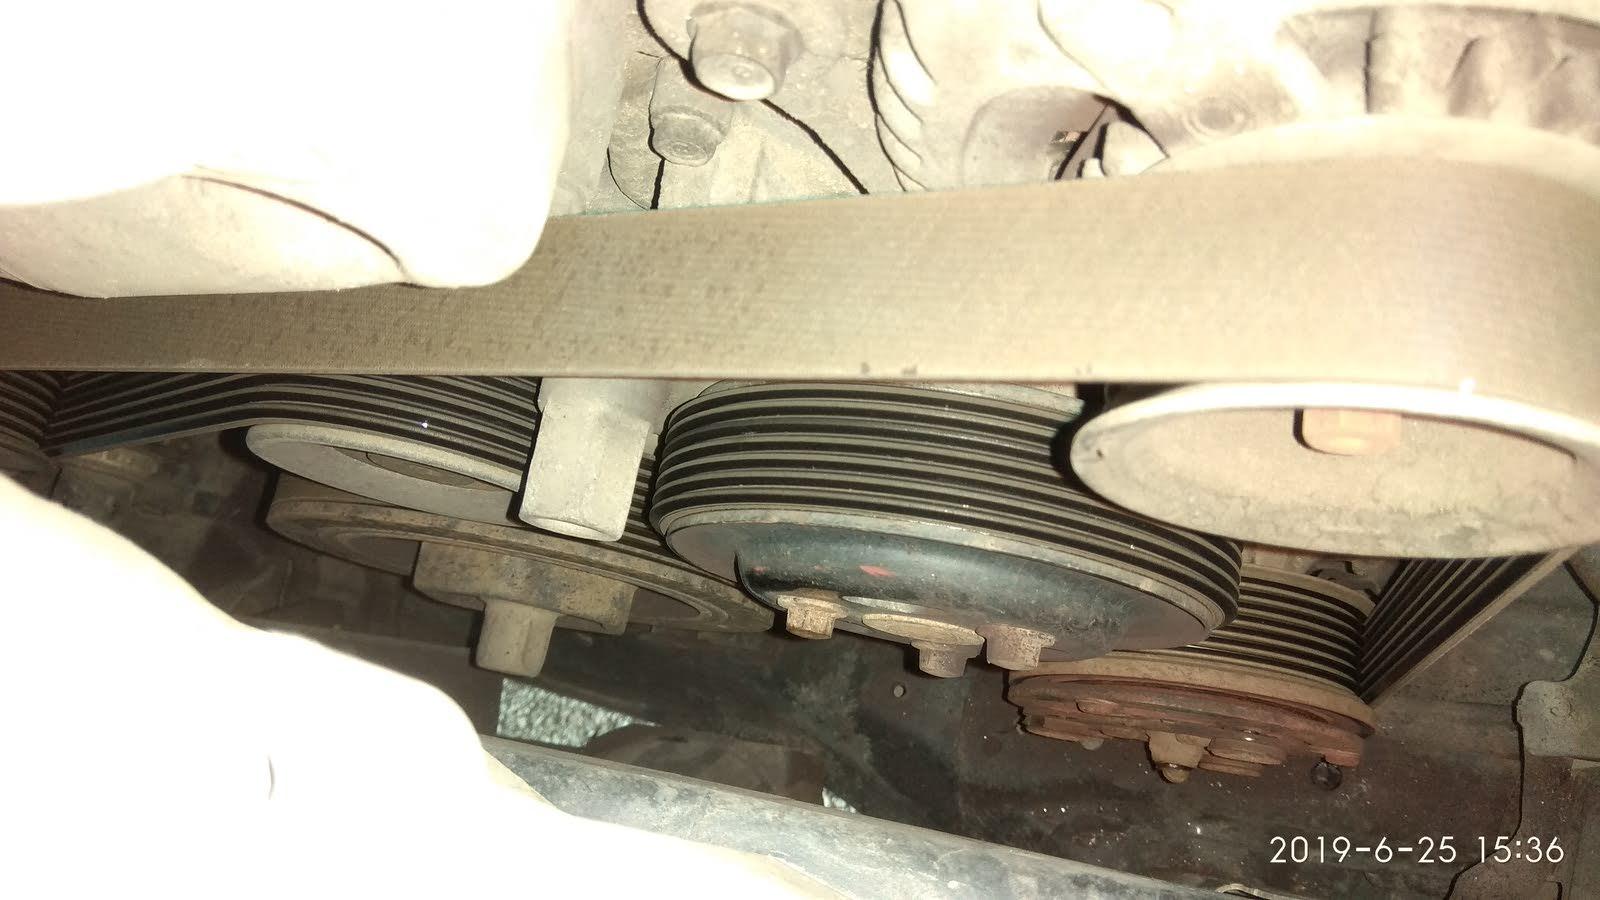 Honda Cr V Questions Can I Bypass Av Compressor With Sepintentine Belt On 2007 Honda Cr V Cargurus